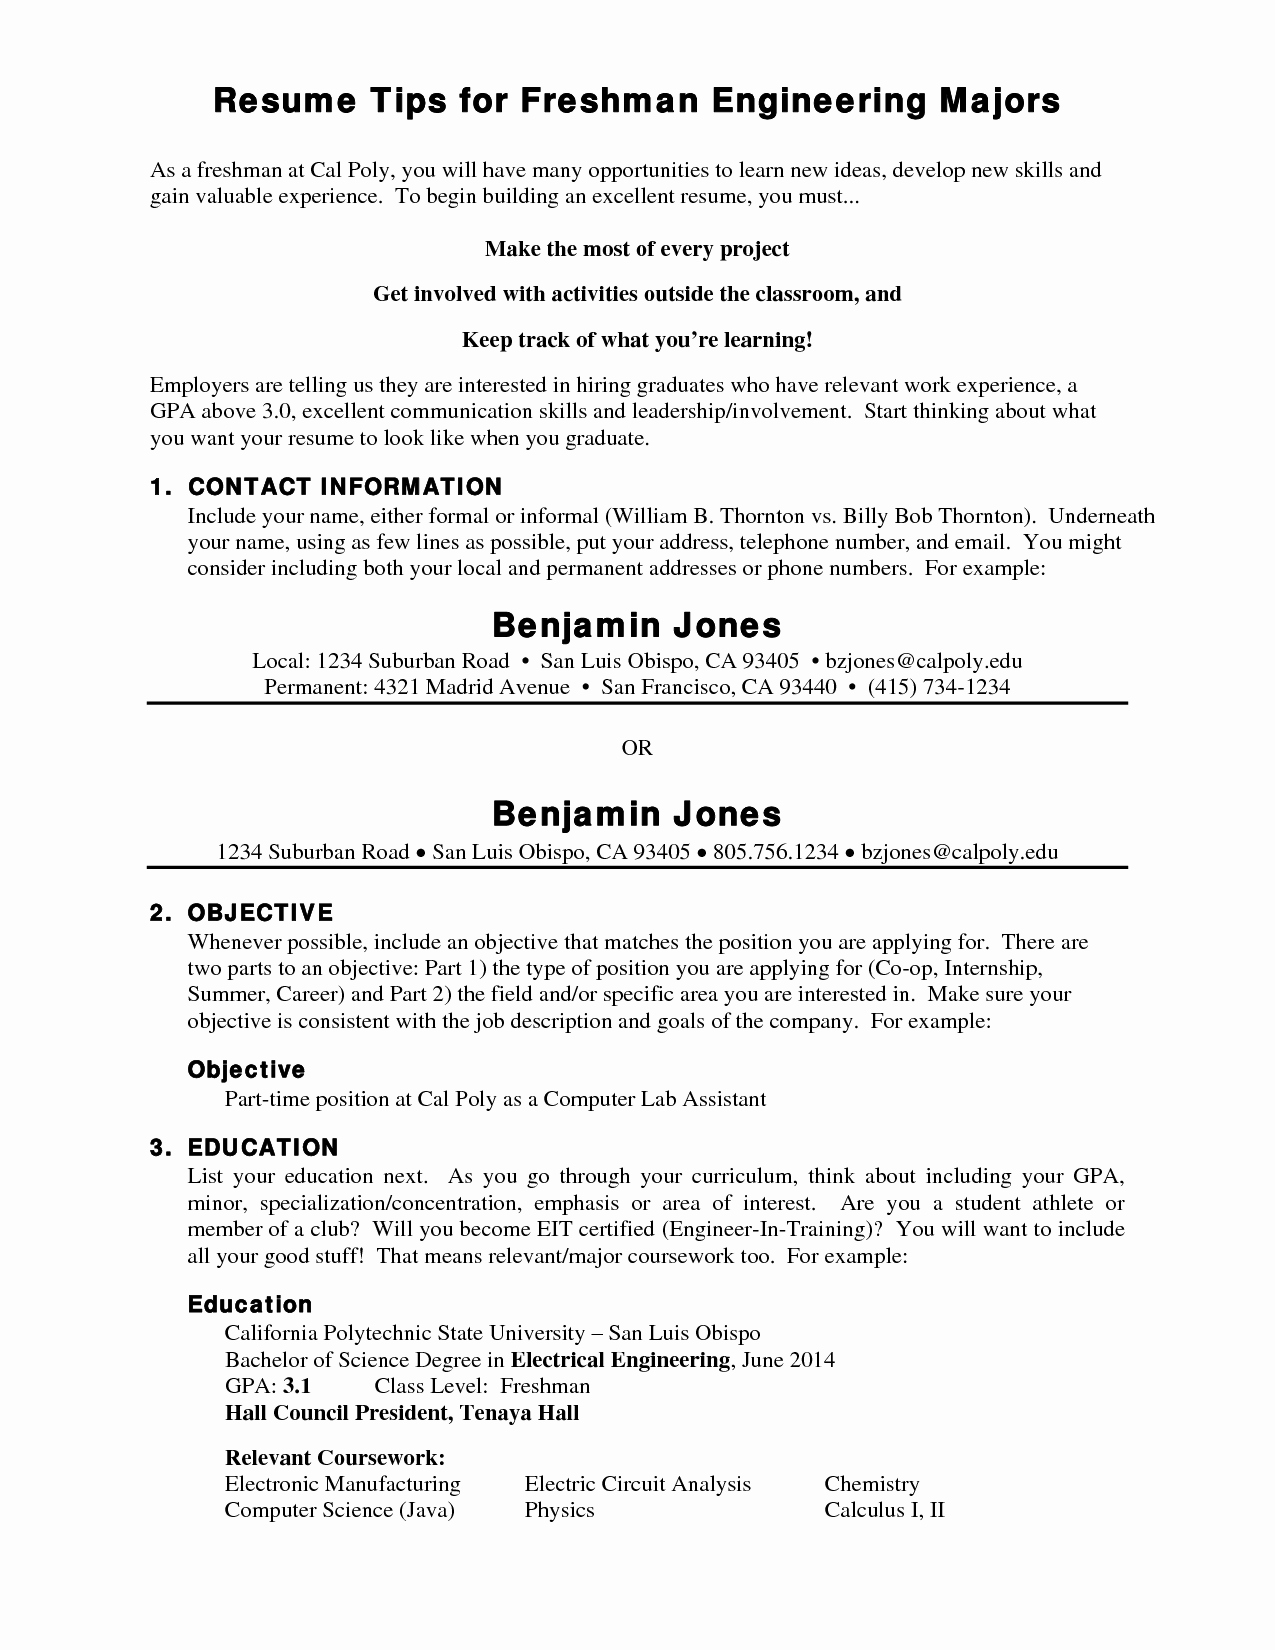 General Paper Essays [a Level] Sample Resume